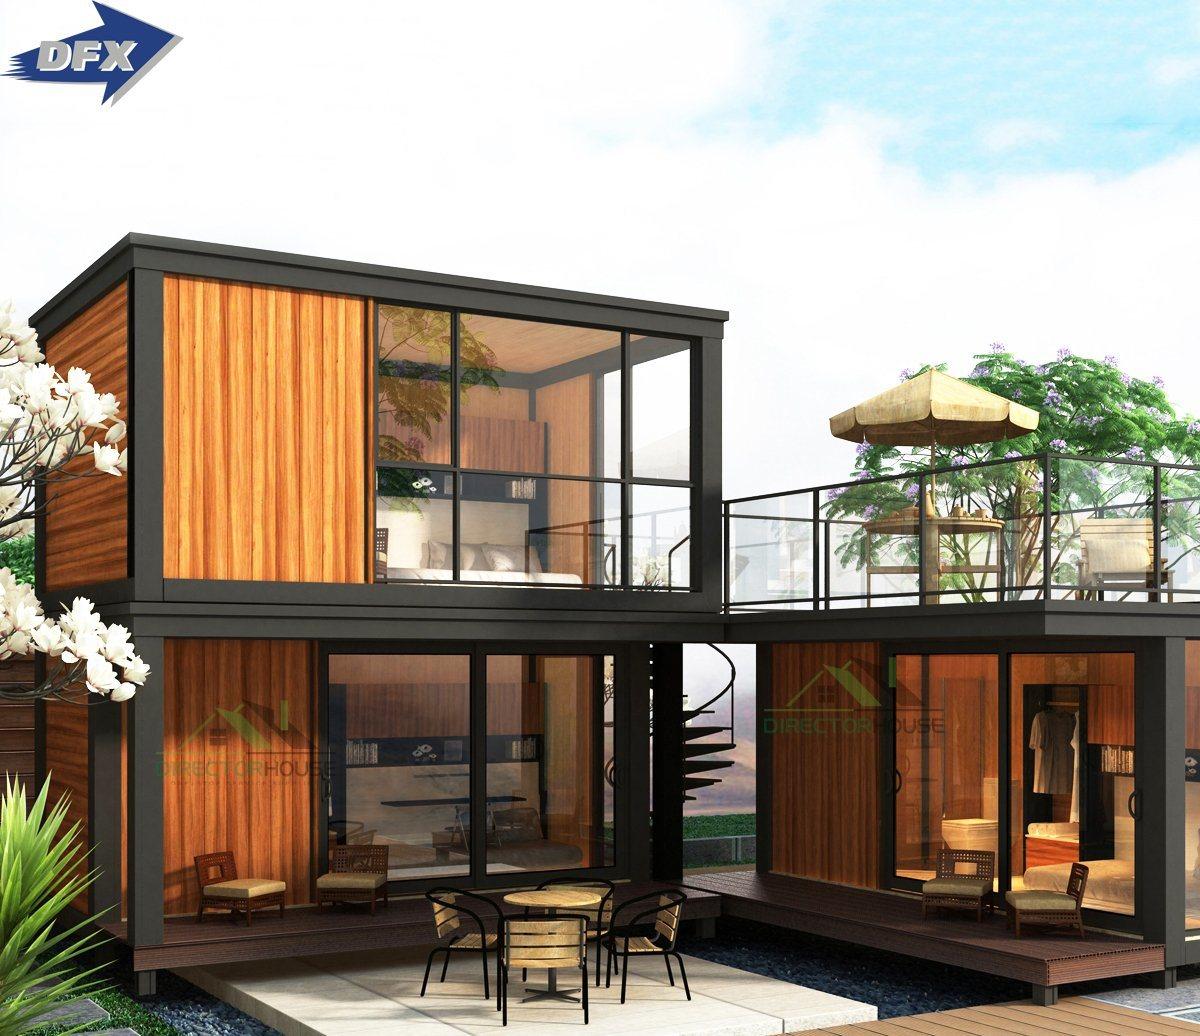 Light Steel Modular Prefab Home Design